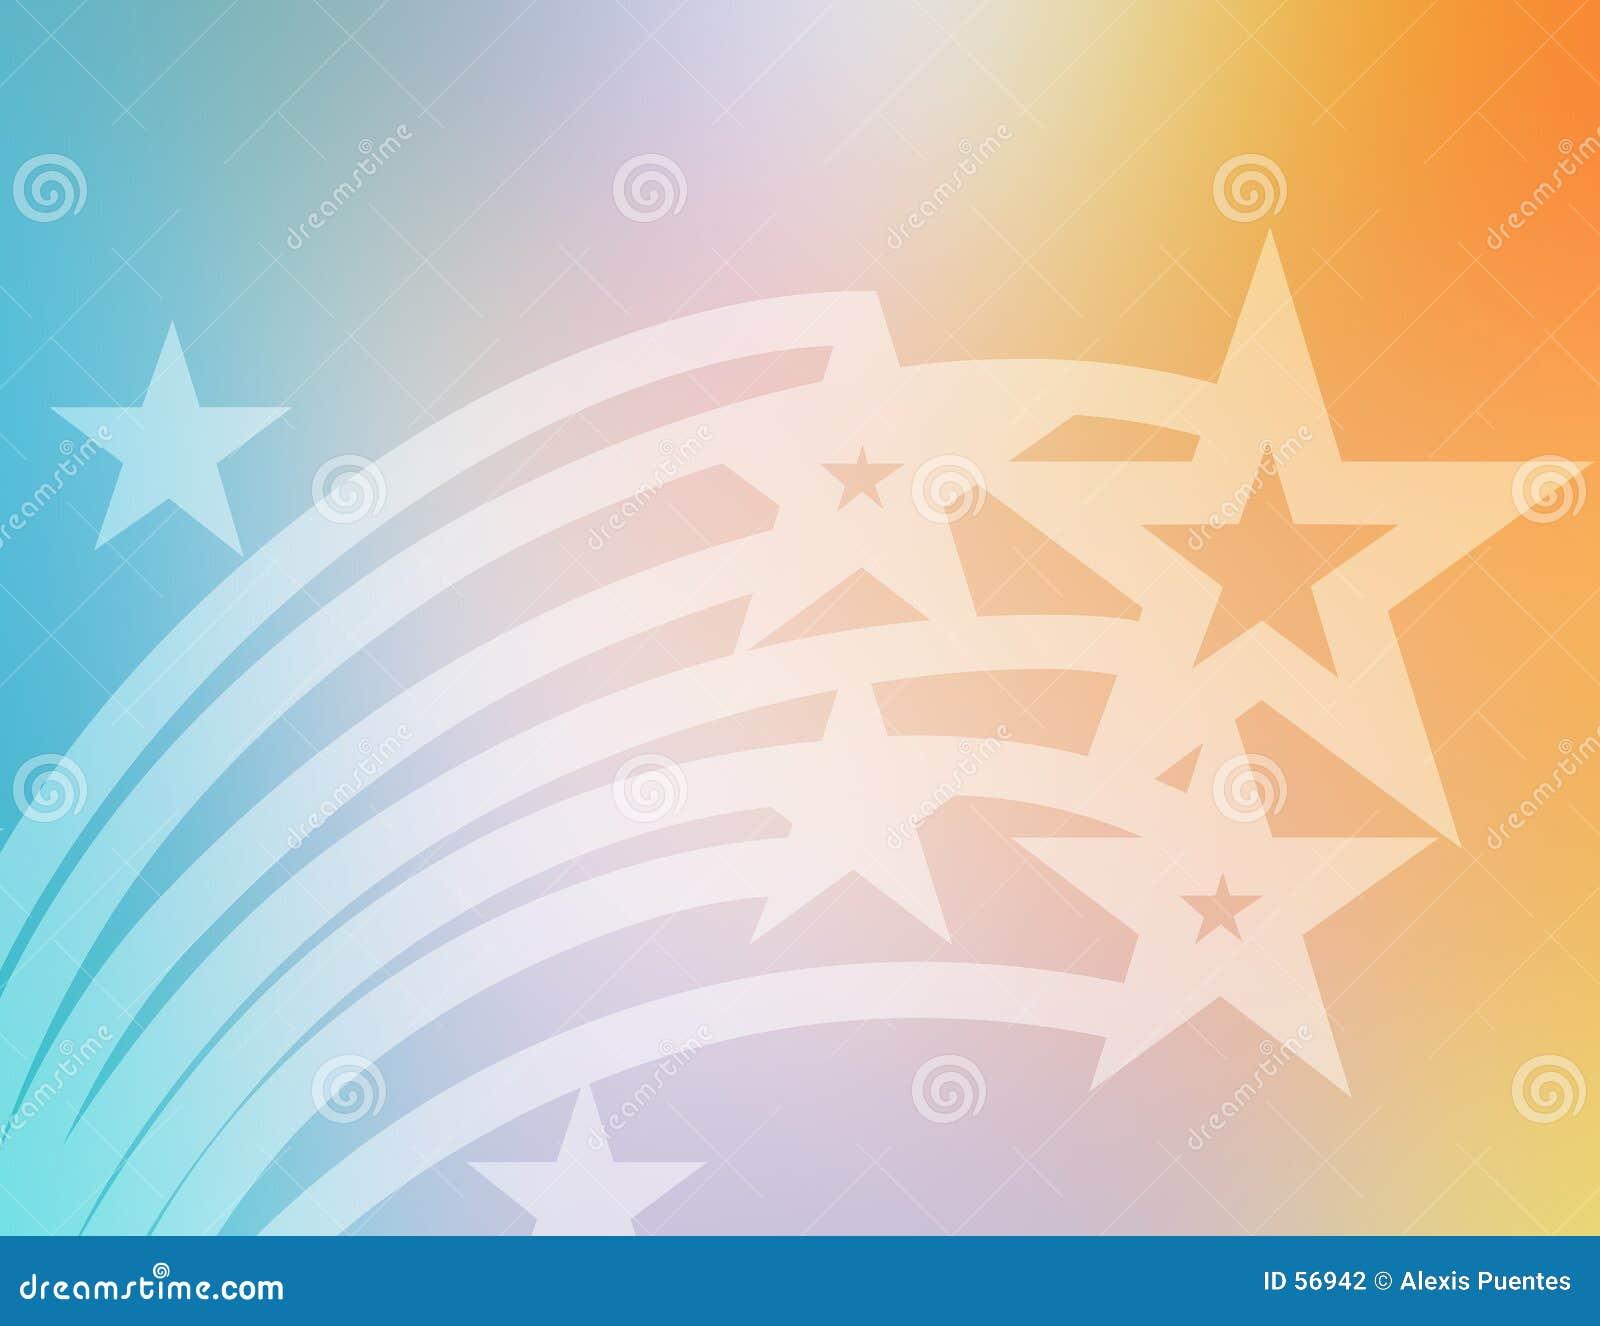 Download Étoiles de vol illustration stock. Illustration du fond - 56942